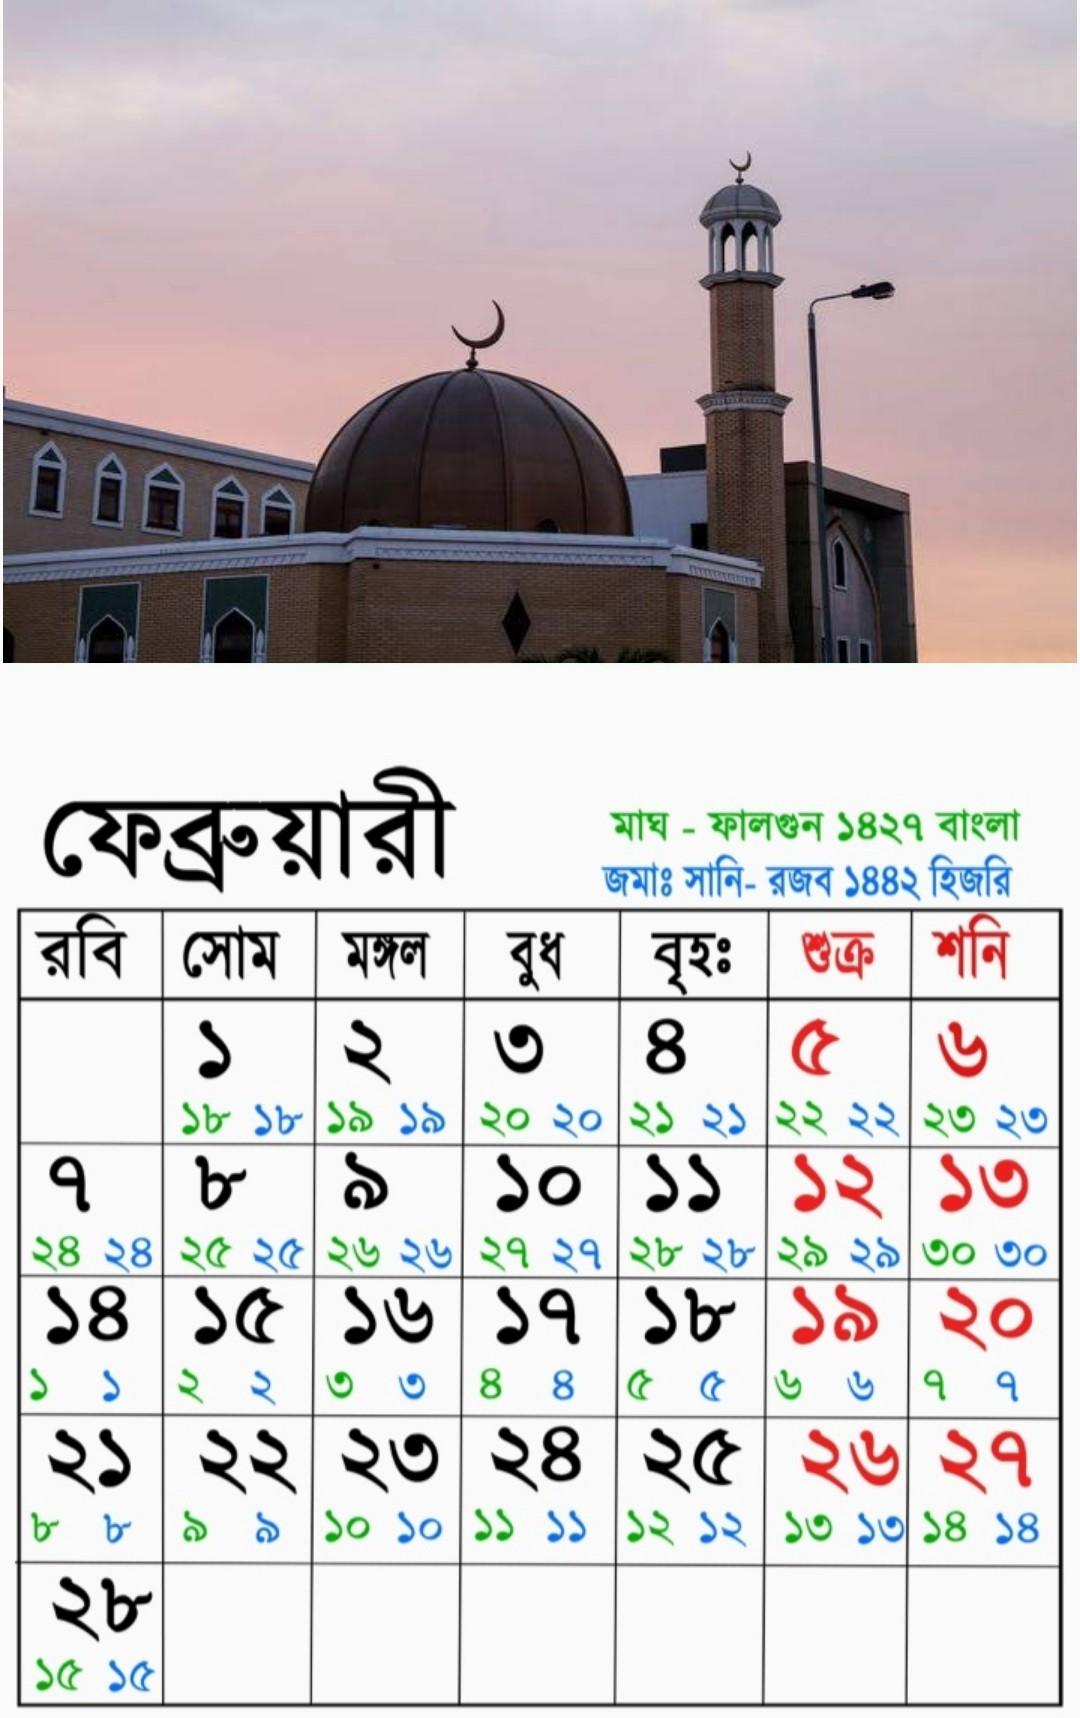 February Bangla English Arabi Calendar 2021 | ফেব্রুয়ারী বাংলা ইংরেজি আরবি ক্যালেন্ডার ২০২১